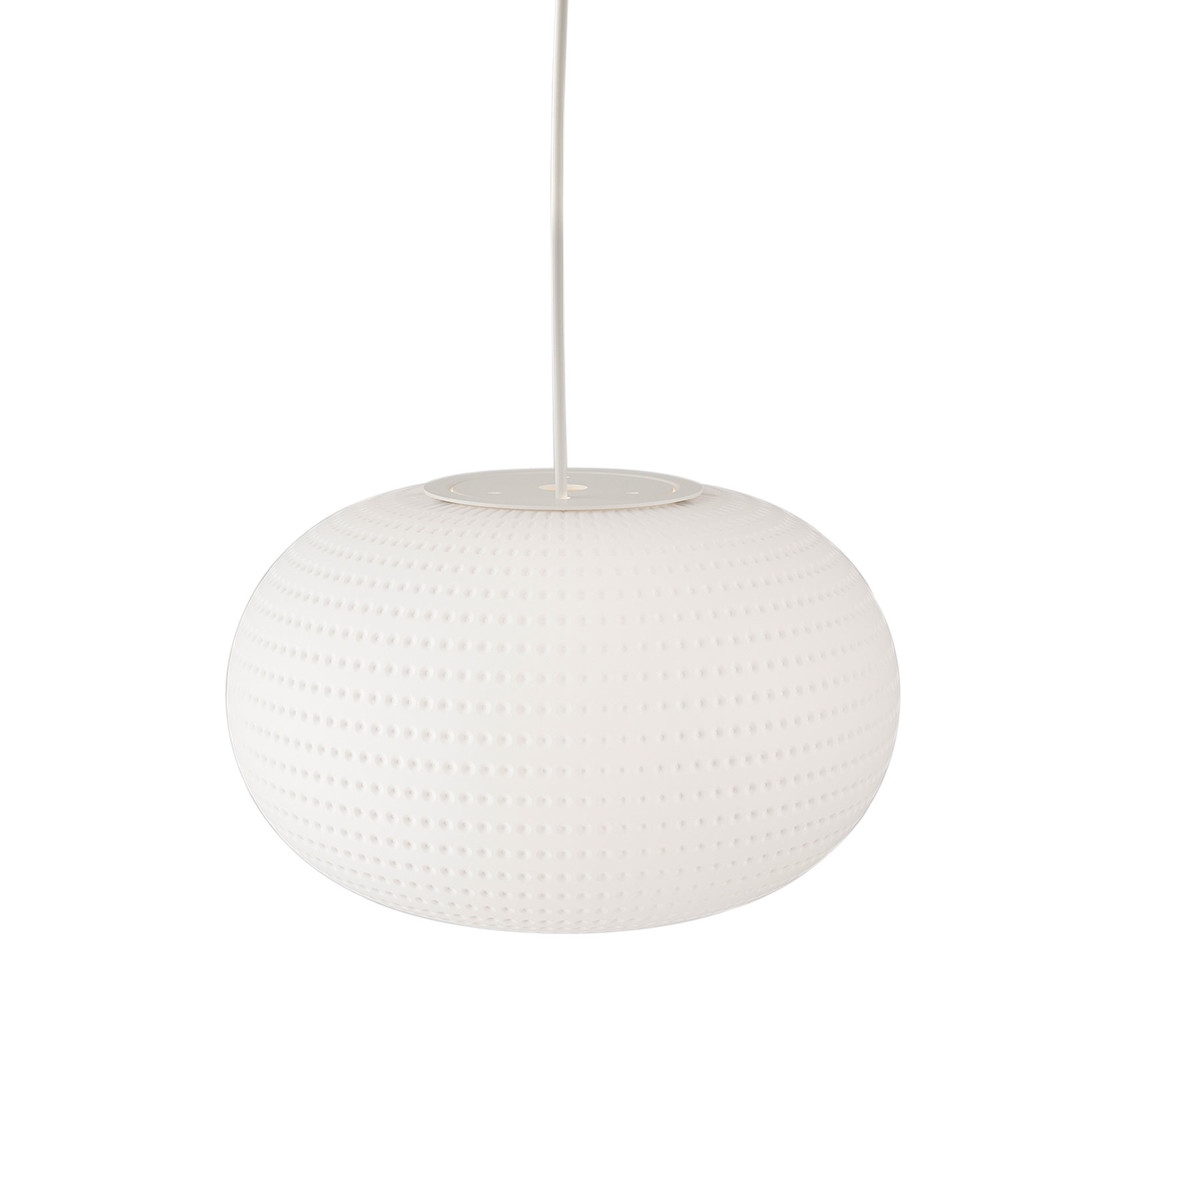 LAMP SOSP BIANCA LED 17,5W 230V BI RAL9002 NO ROSE